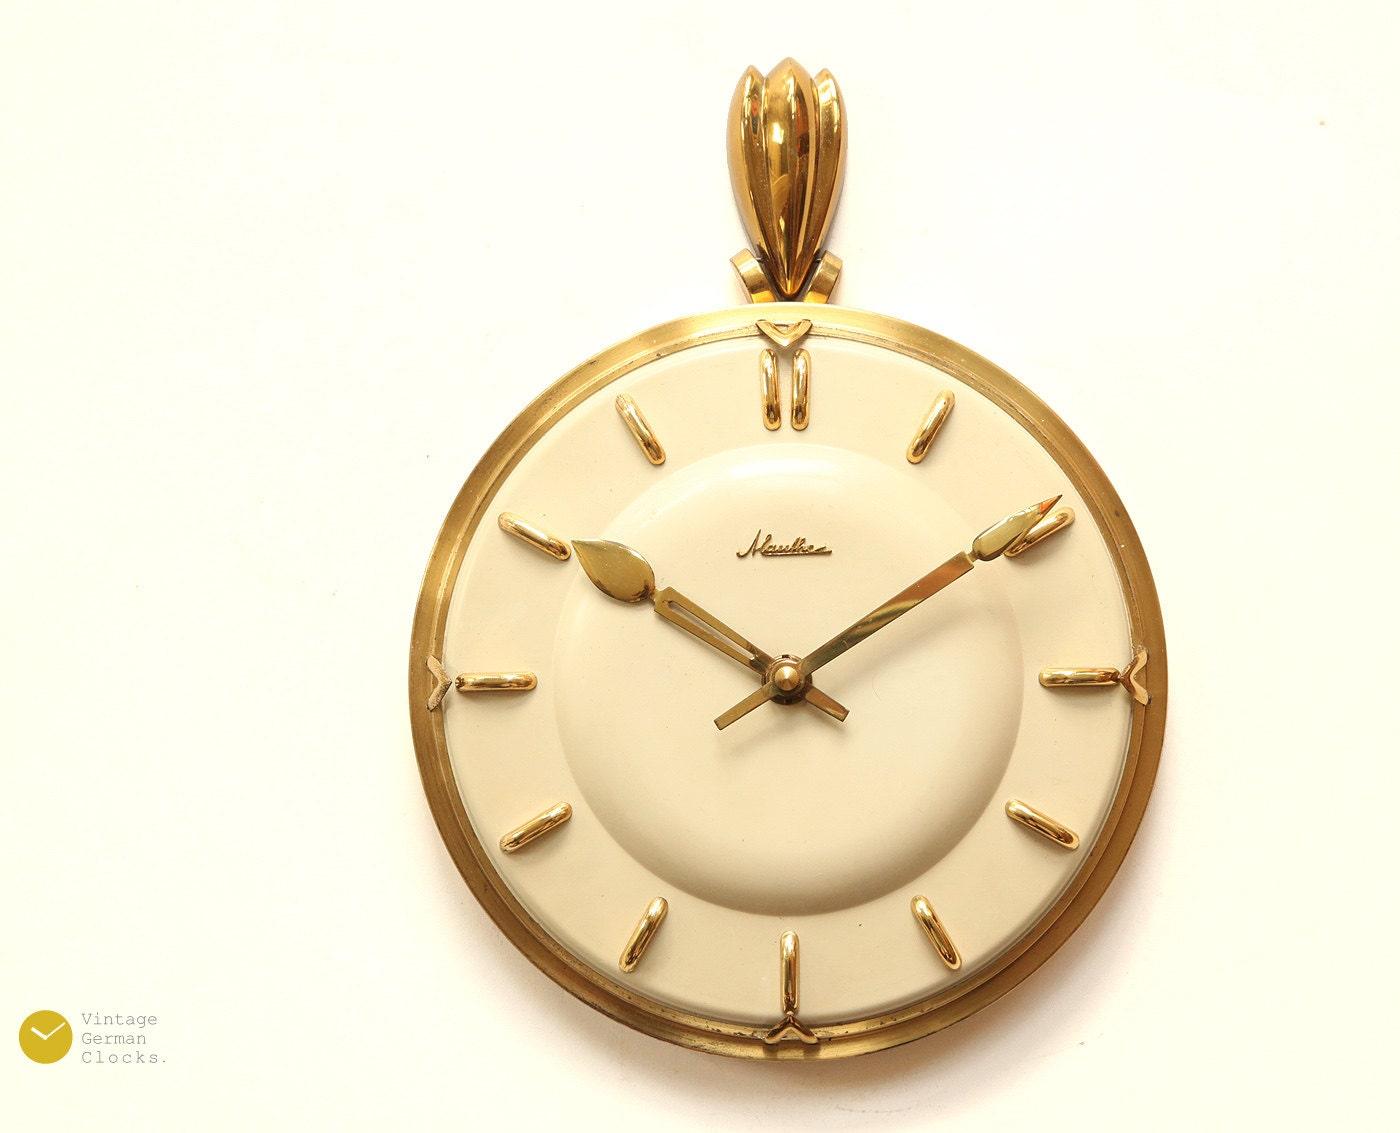 Gorgeous MAUTHE ART DECO Wall Clock 40s Kienzle Mid Century